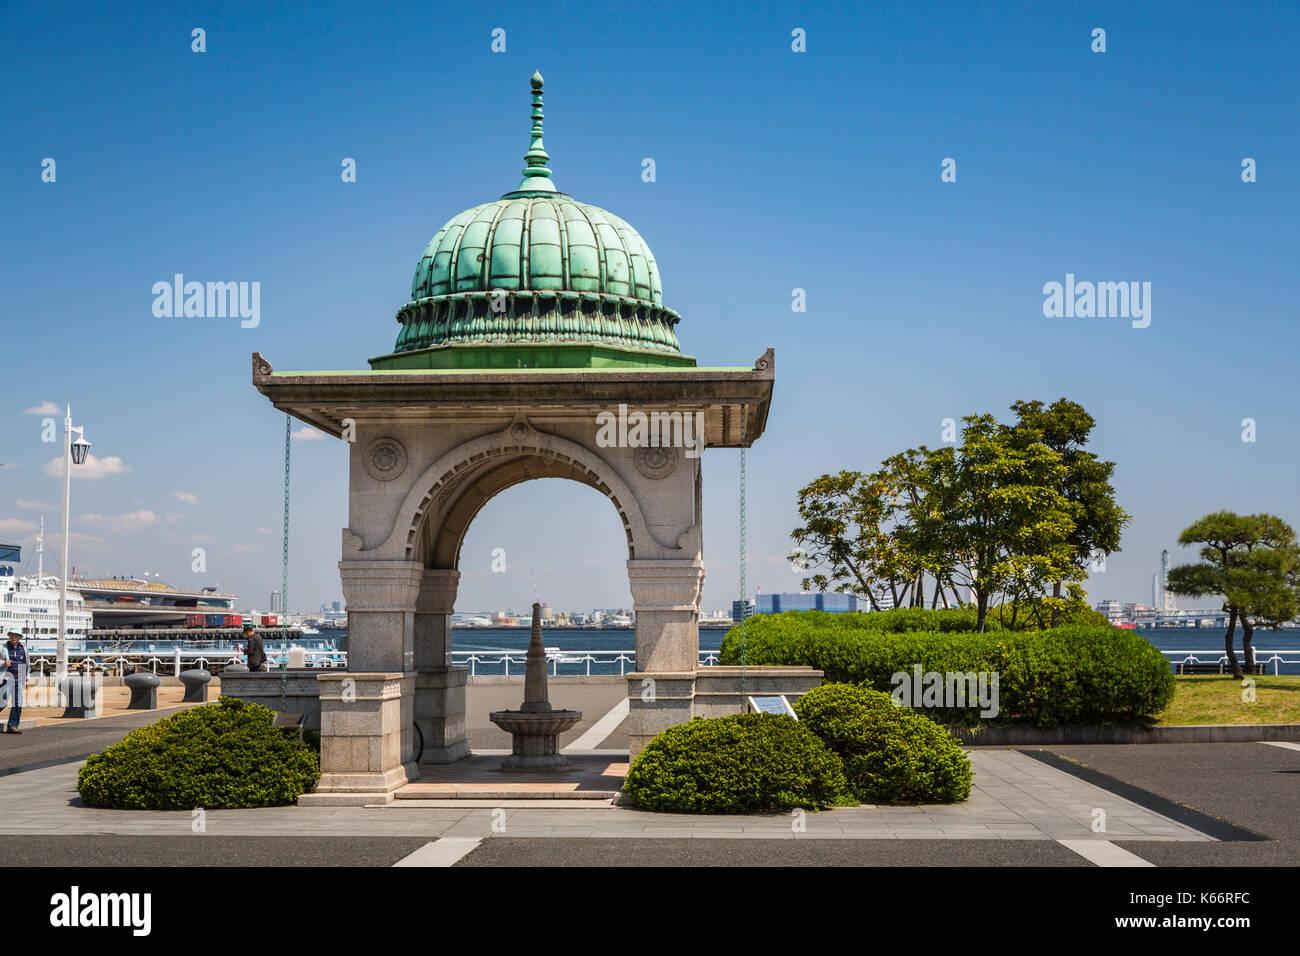 the port of yokohama Port of yokohama's wiki: the port of yokohama (横浜港, yokohama-kō) is operated by the port and harbor bureau of the city of yokohama in japan it opens onto tokyo bay.